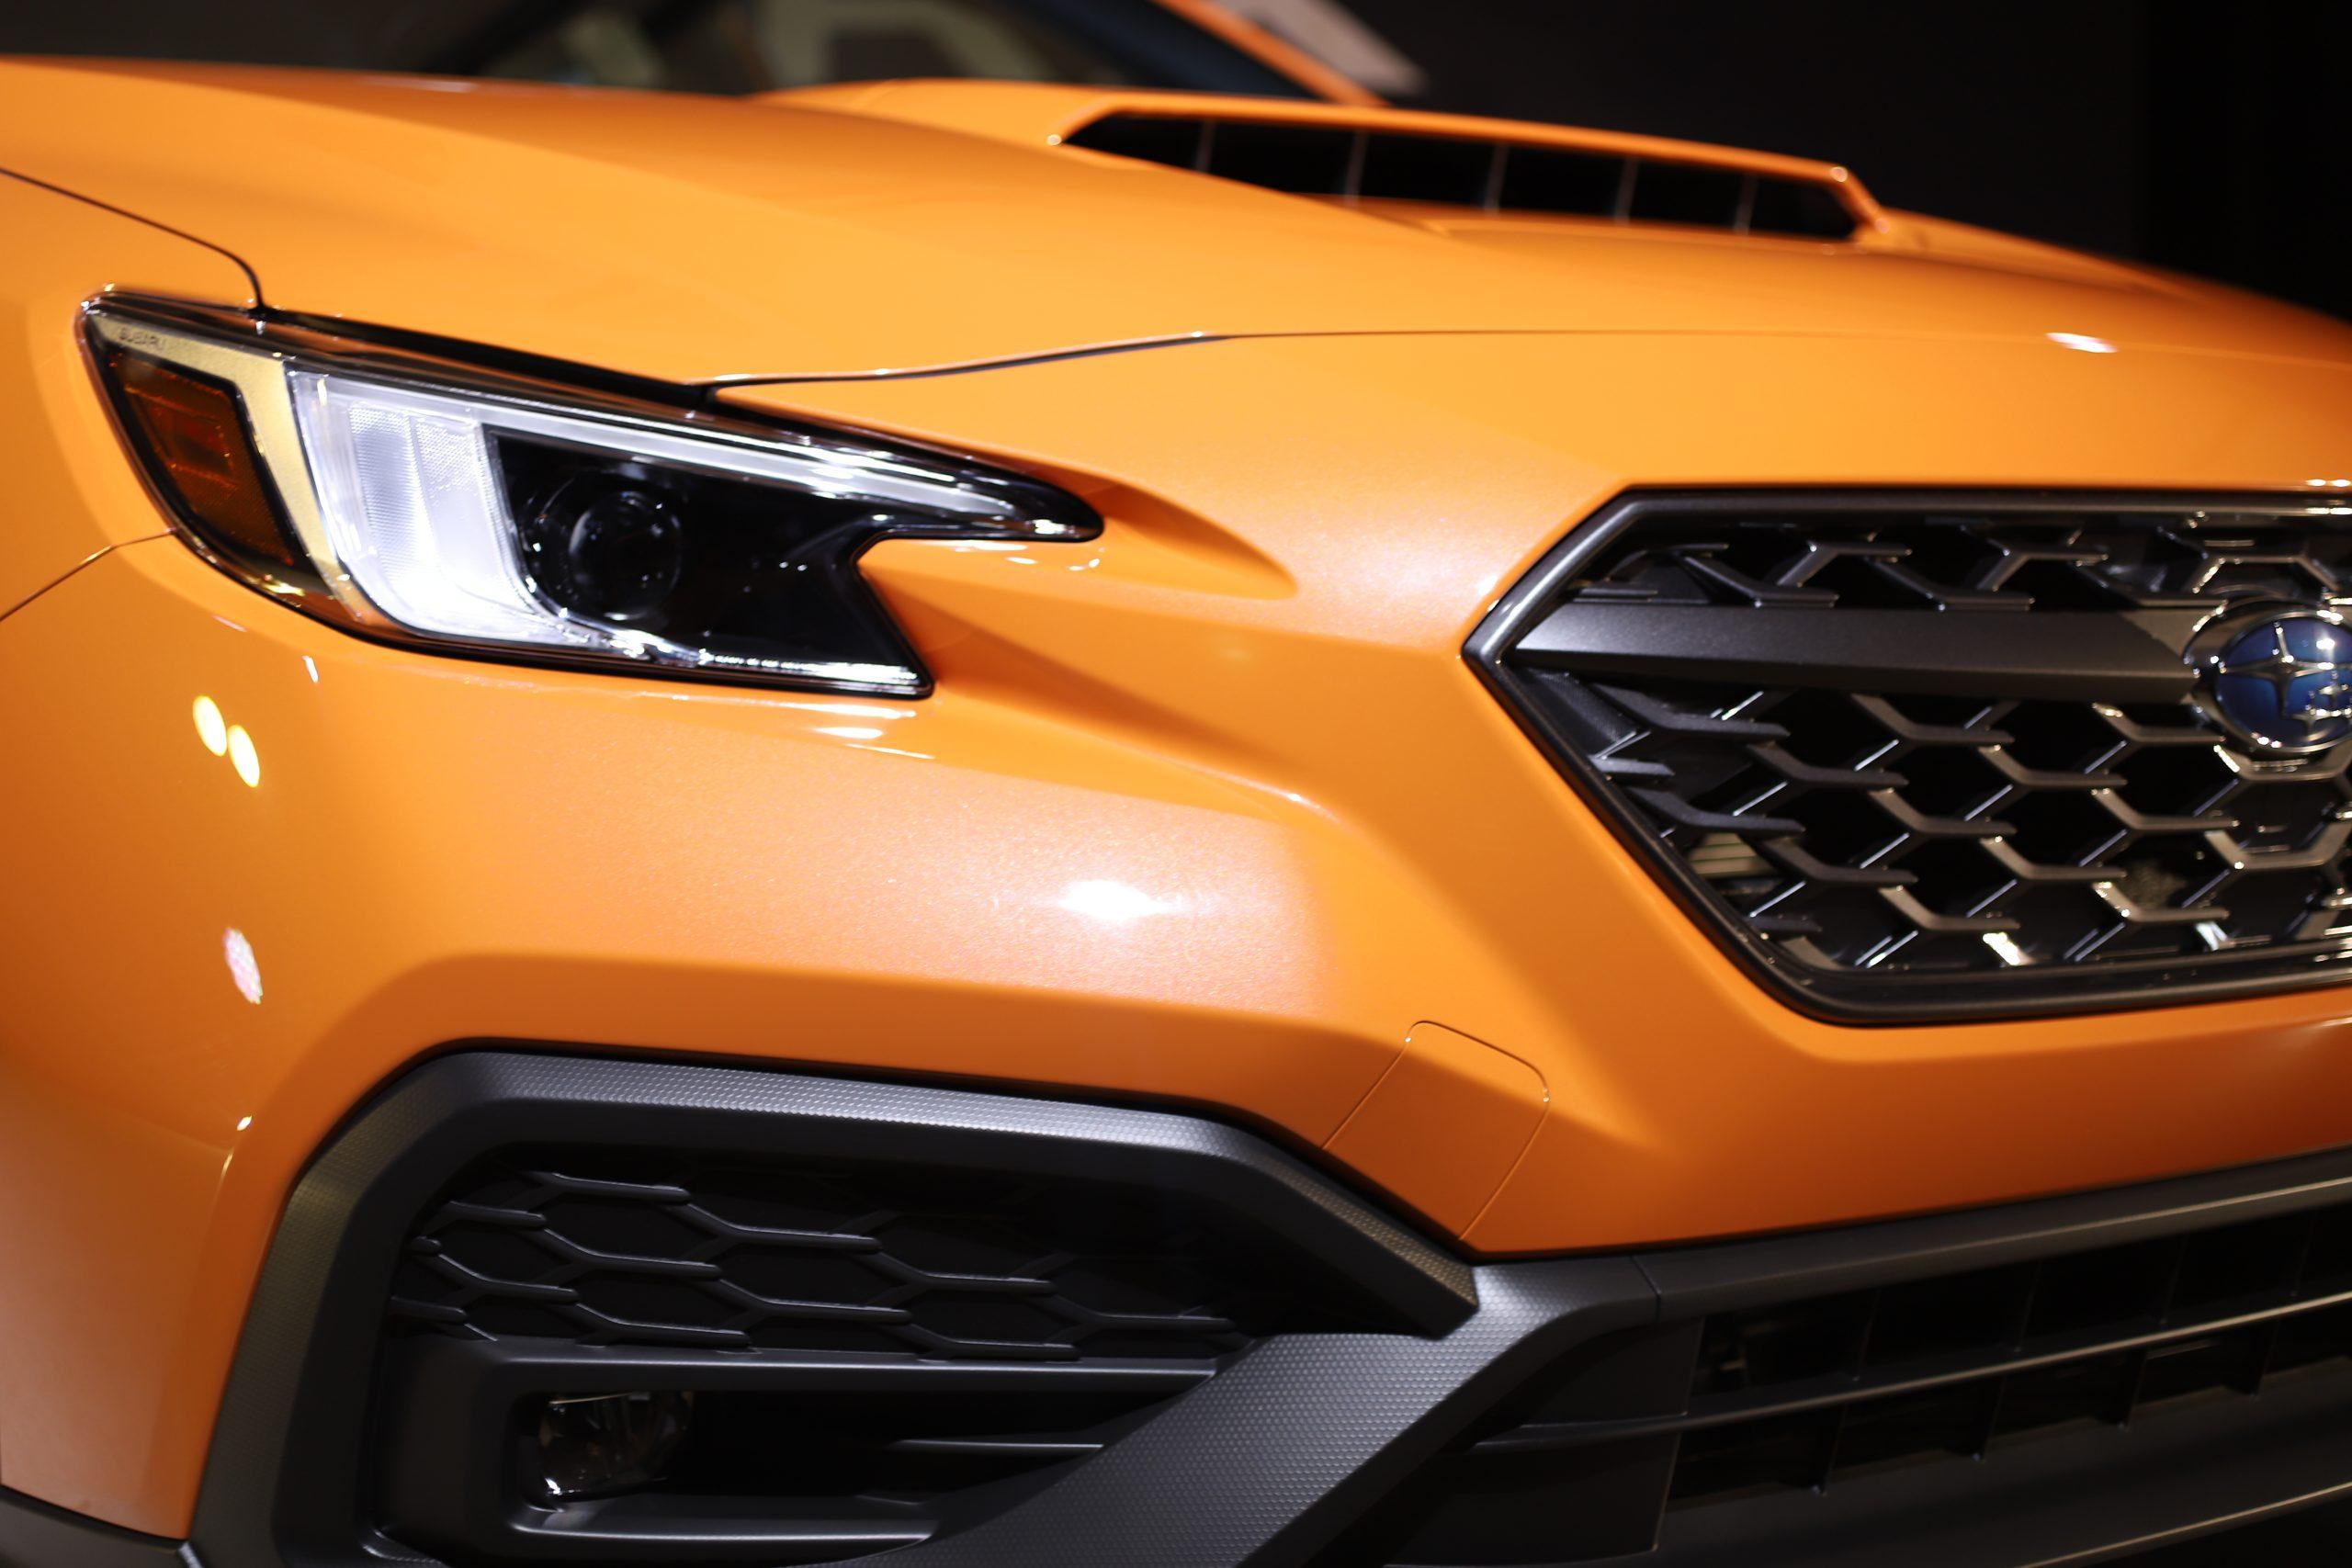 2022 Subaru WRX orange front end close